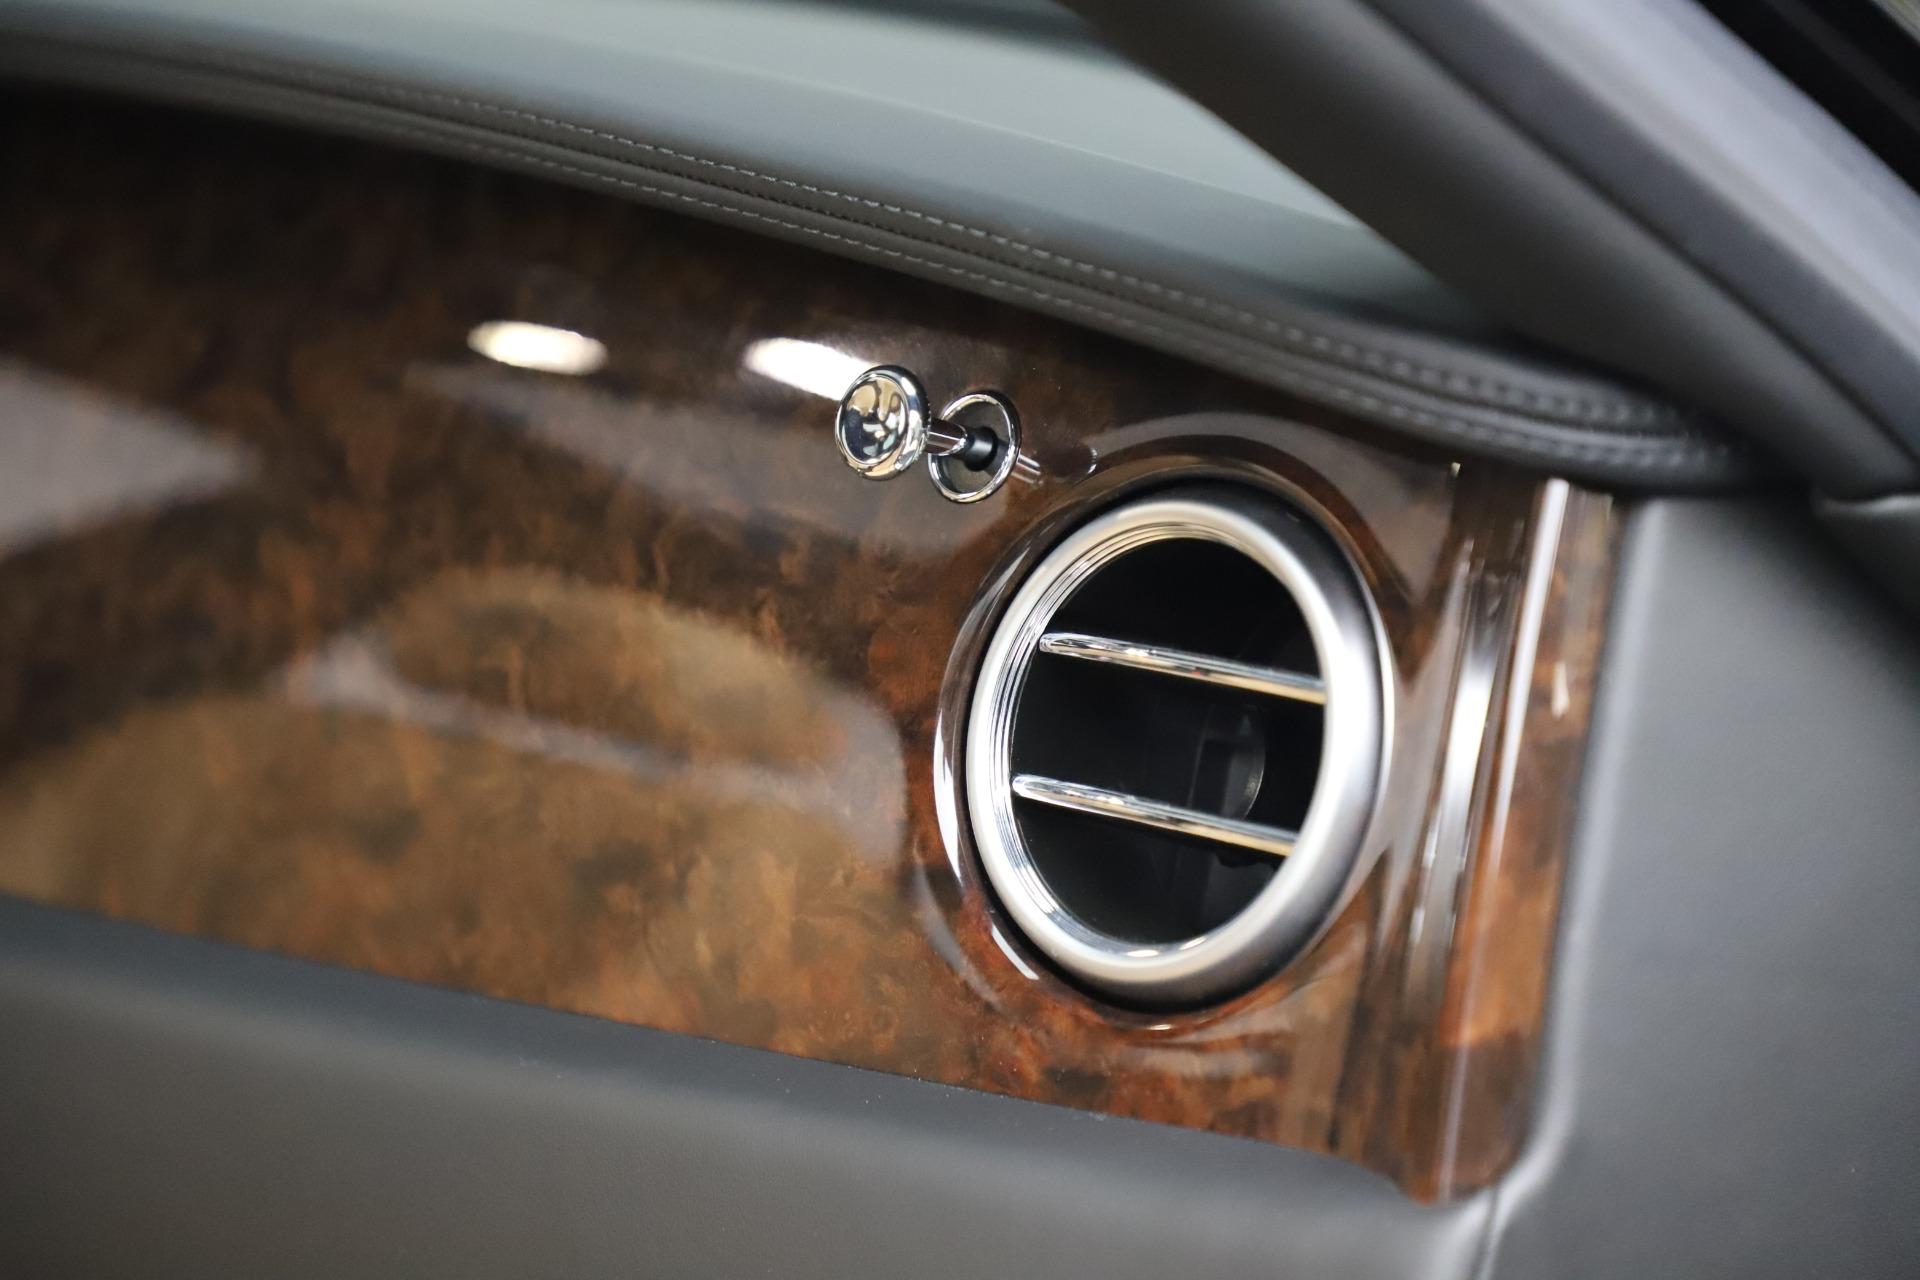 Used 2016 Bentley Flying Spur V8 For Sale In Westport, CT 3526_p31